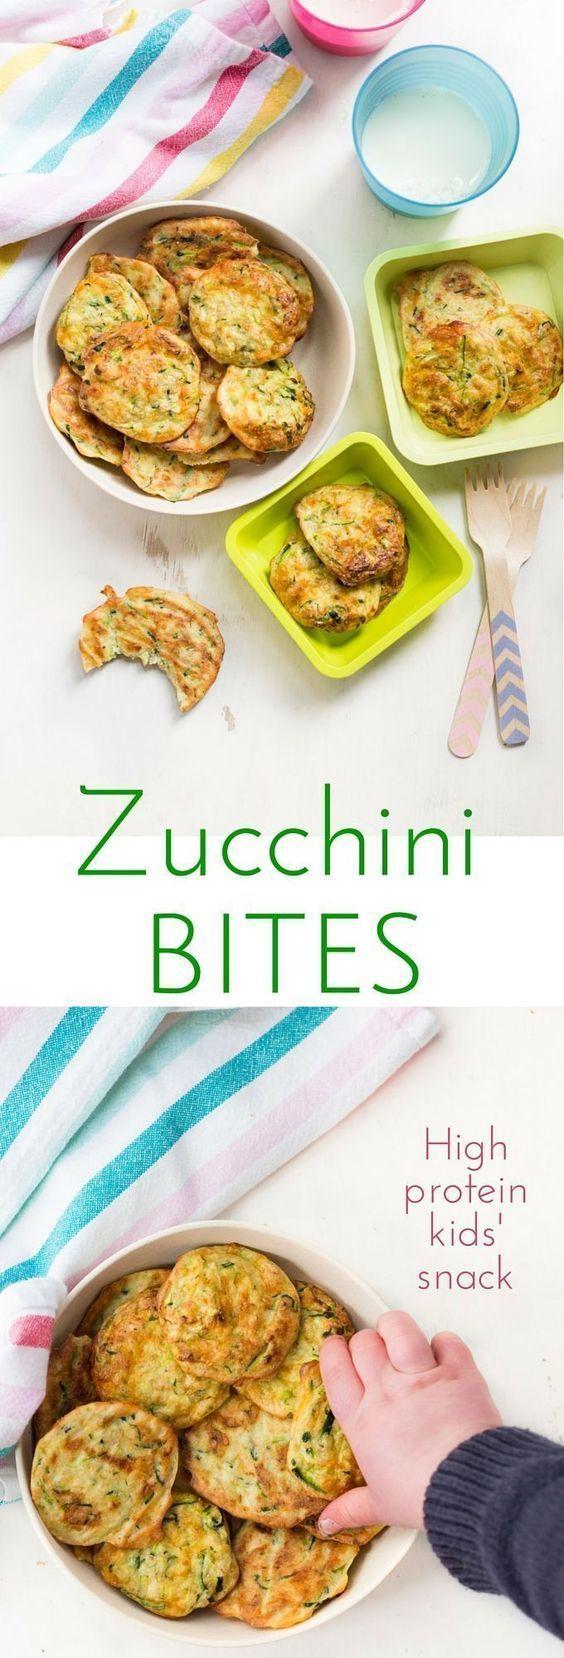 Zucchini Bites   - No carb meals -